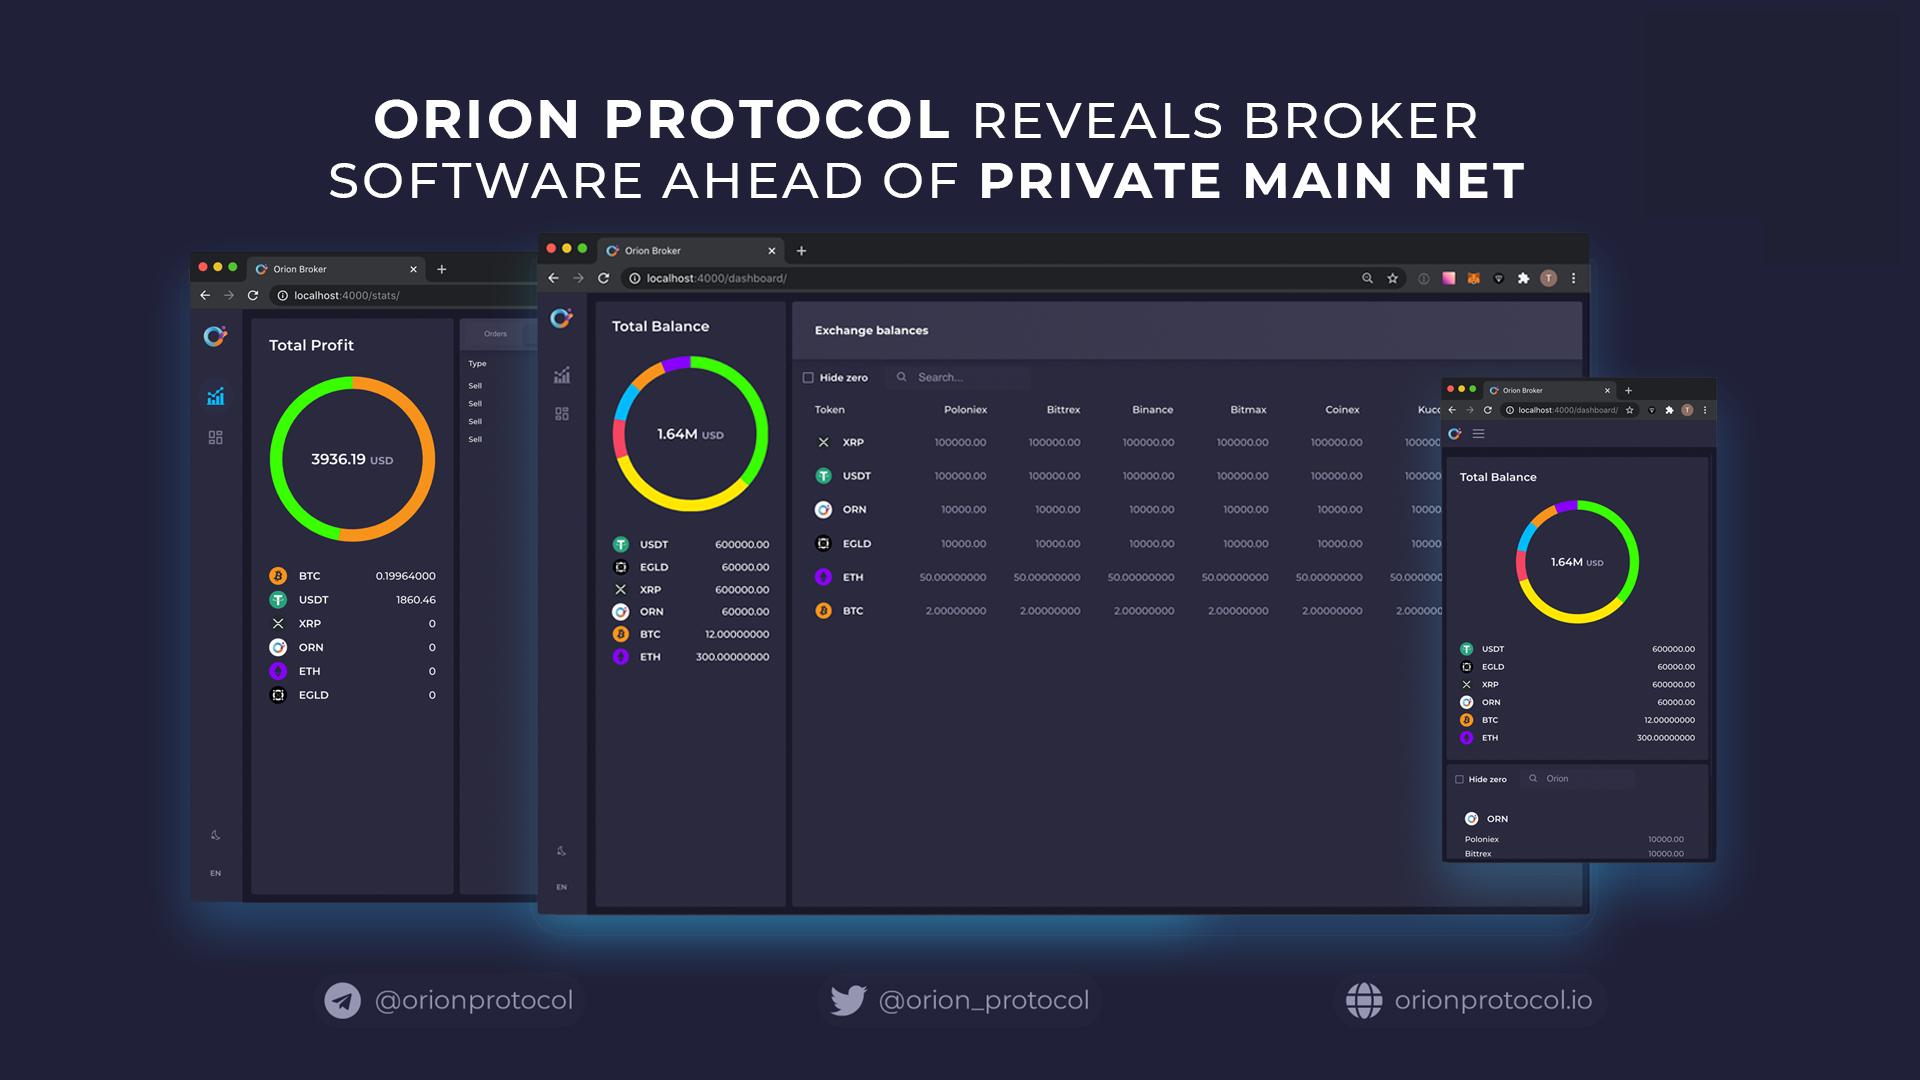 Orion Protocol Reveals Broker Software